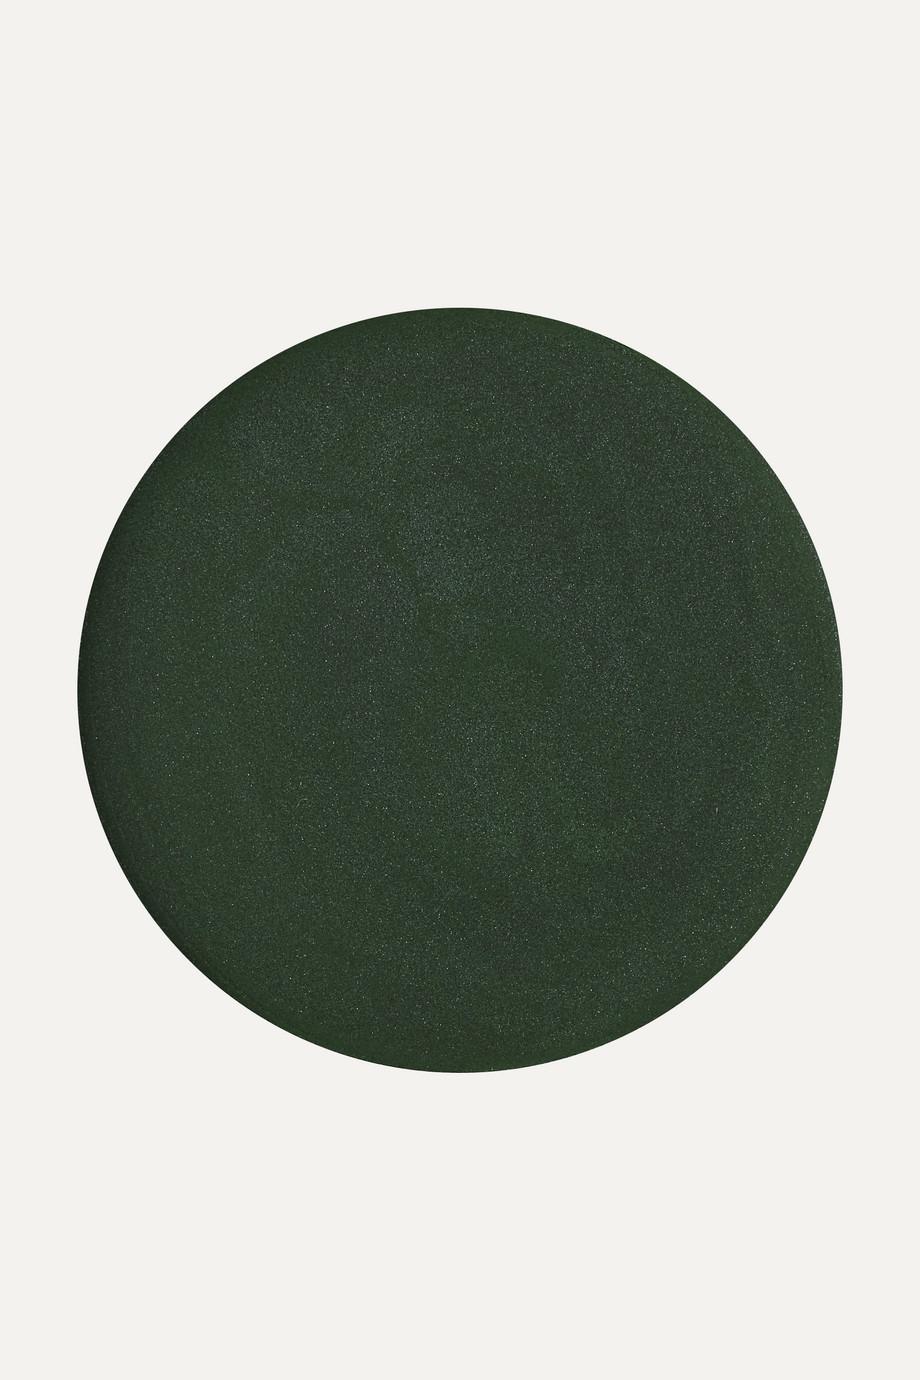 Kjaer Weis Cream Eye Shadow - Sublime